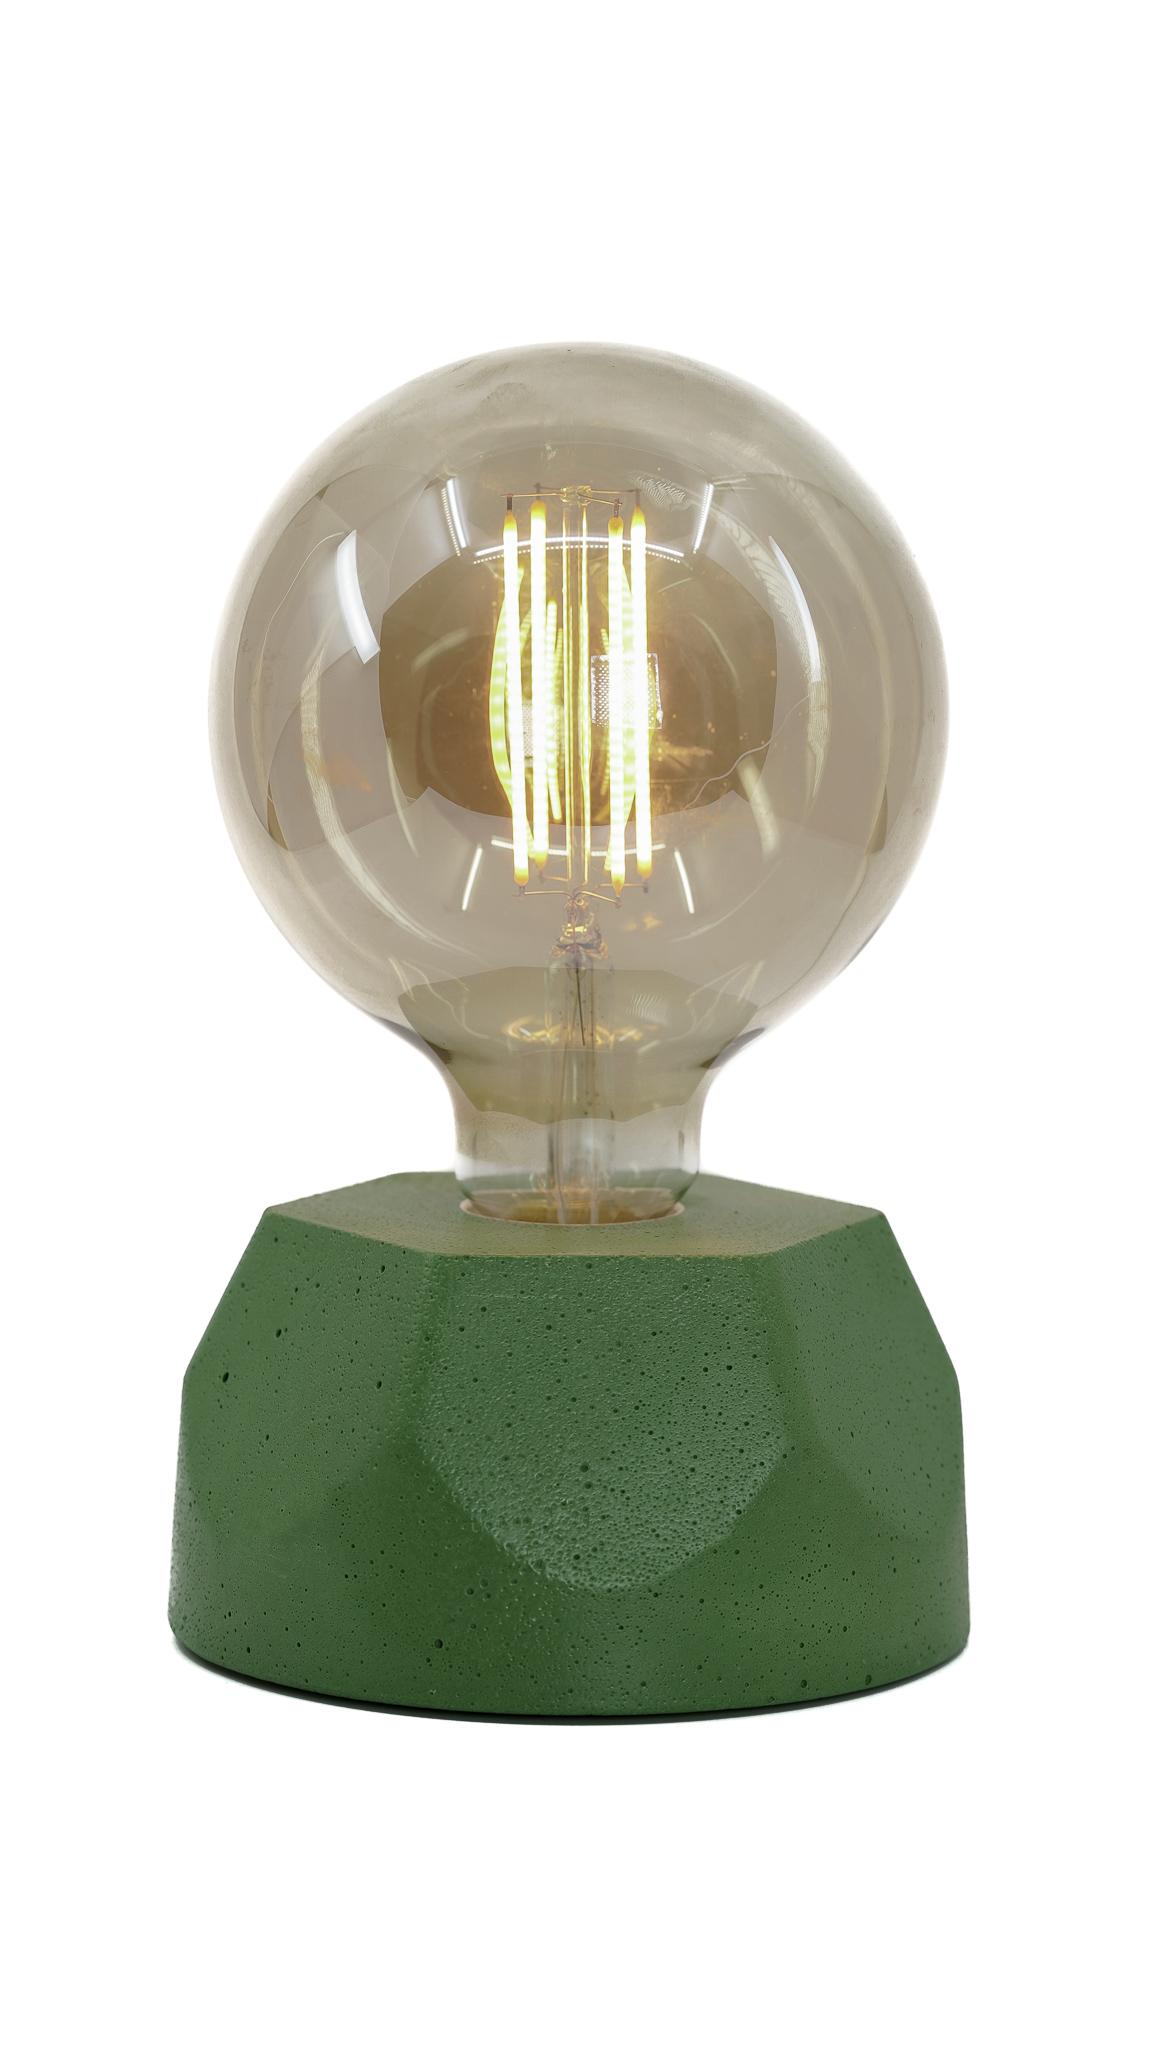 Lampe hexagone en béton vert fabrication artisanale